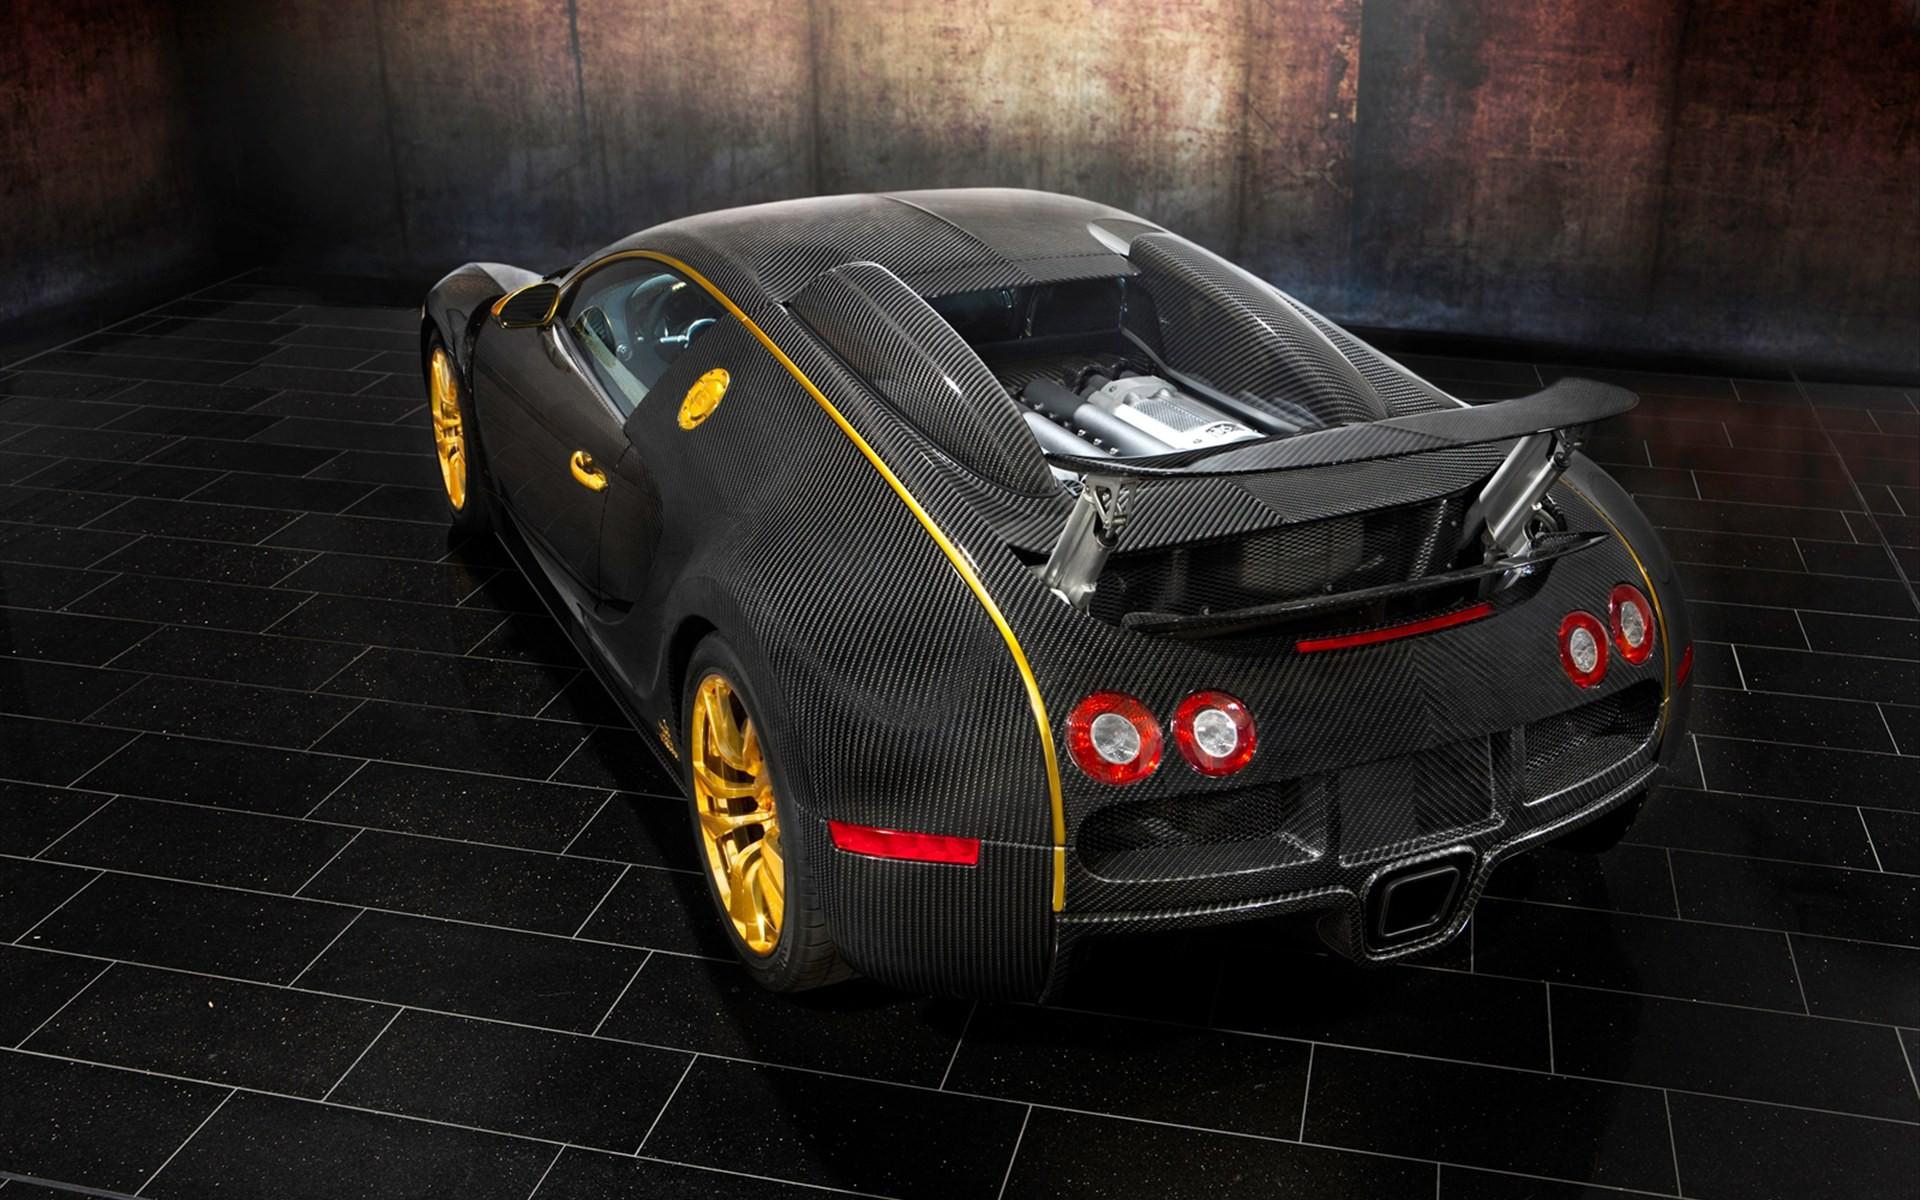 bugatti veyron mansory hd 1920x1200 imagenes. Black Bedroom Furniture Sets. Home Design Ideas